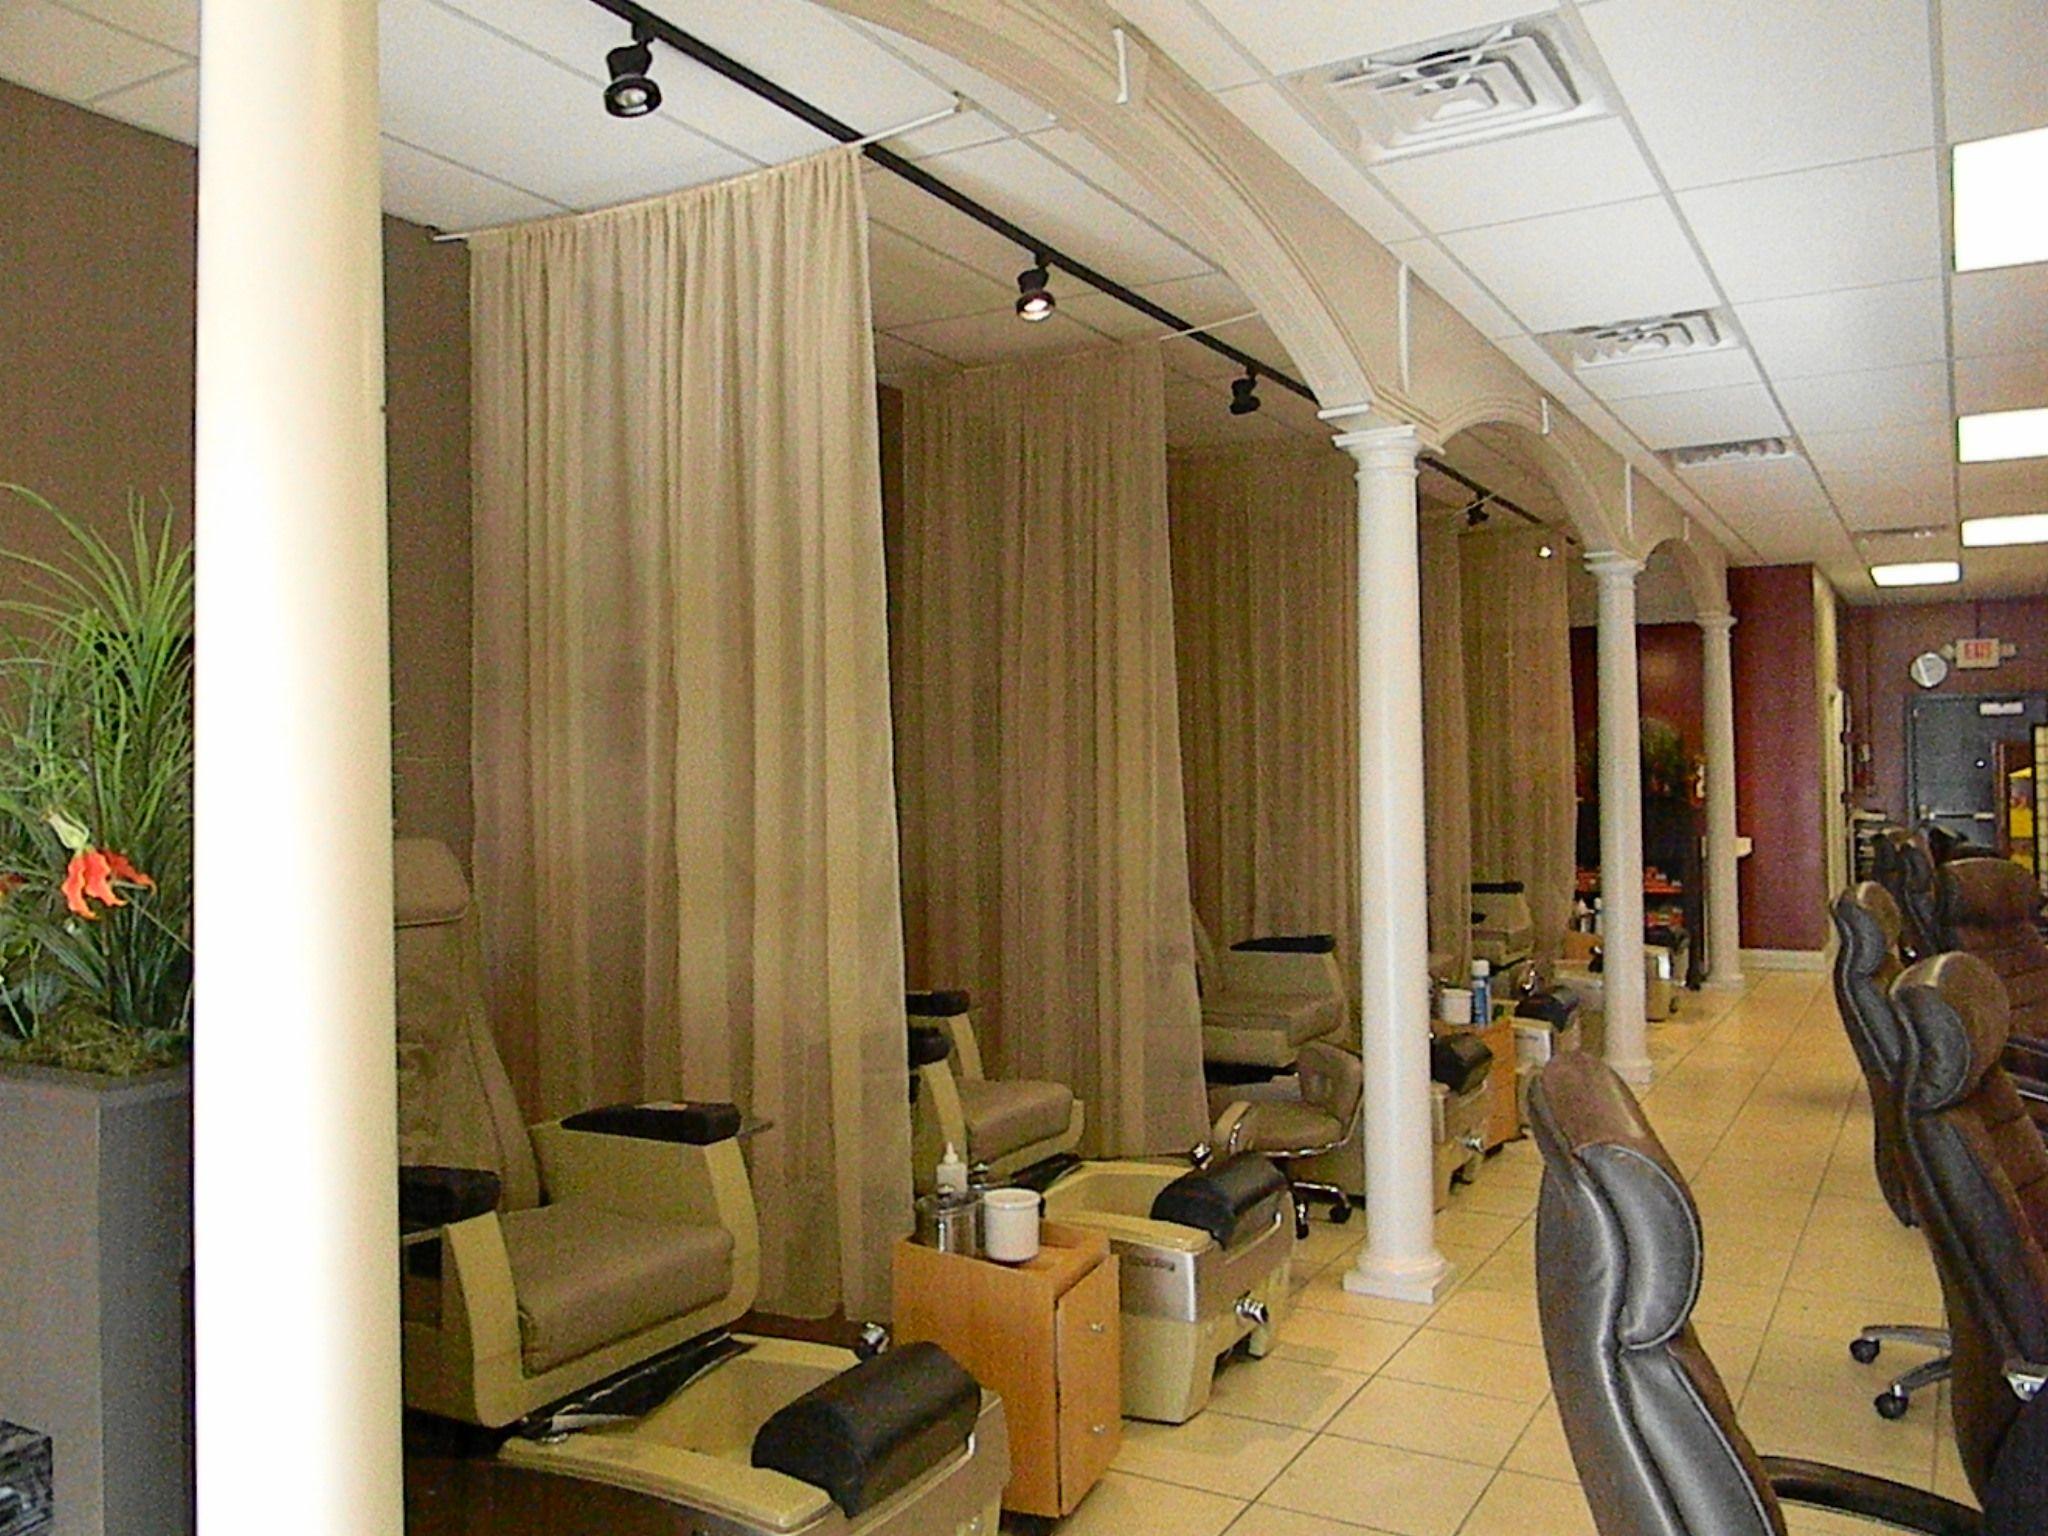 Nail Salon Ideas Design Nail Salon Interior Design Ideas With Low Budget Nail Salon Interior De Salon Interior Design Nail Salon Interior Design Salon Interior